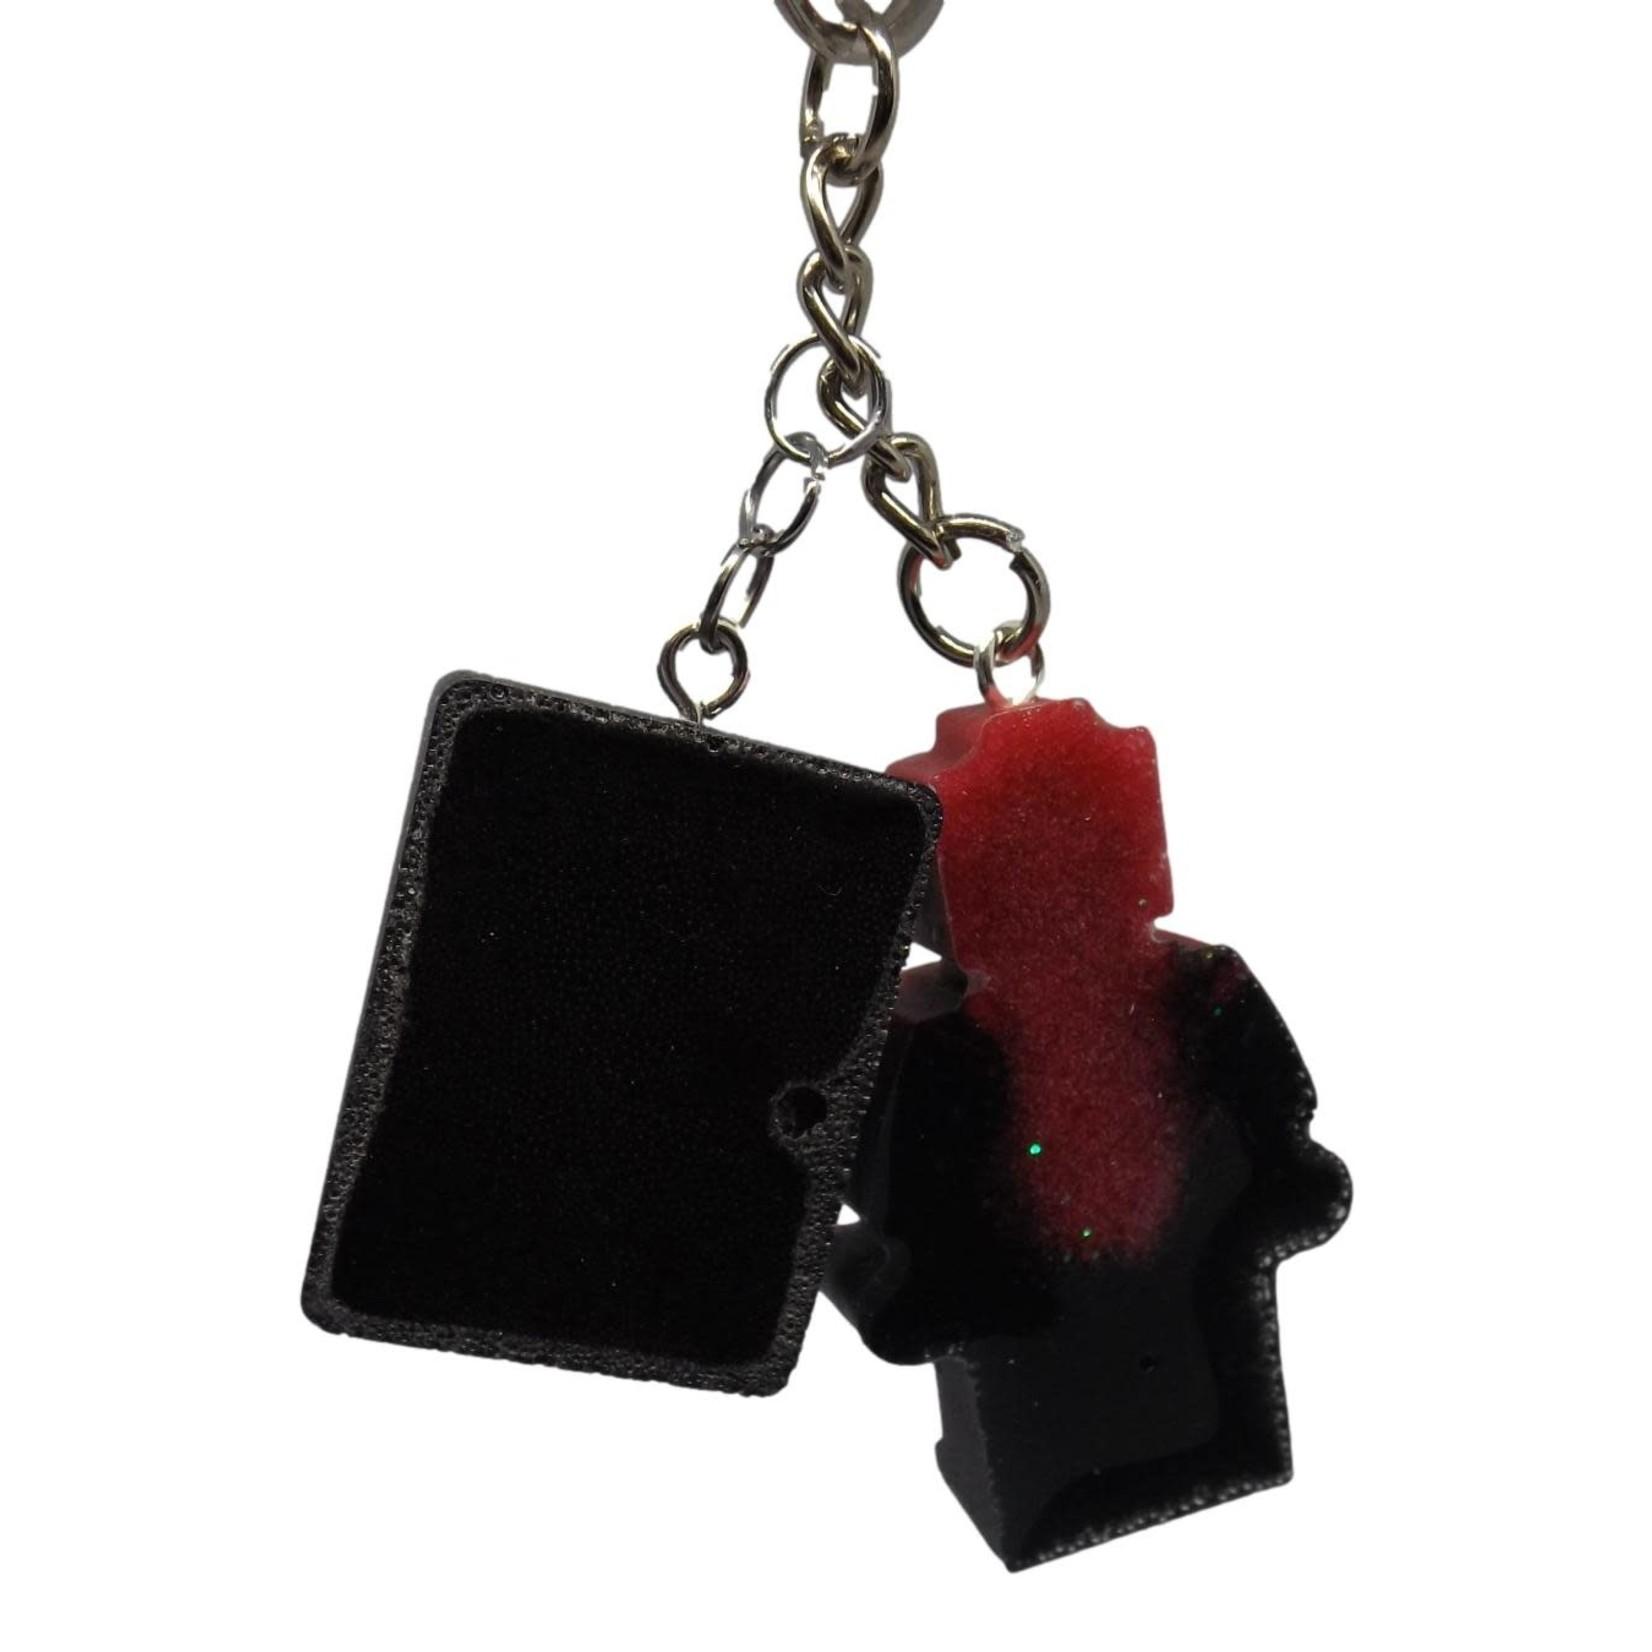 East Coast Sirens Red & Black Lego Man Key Chain